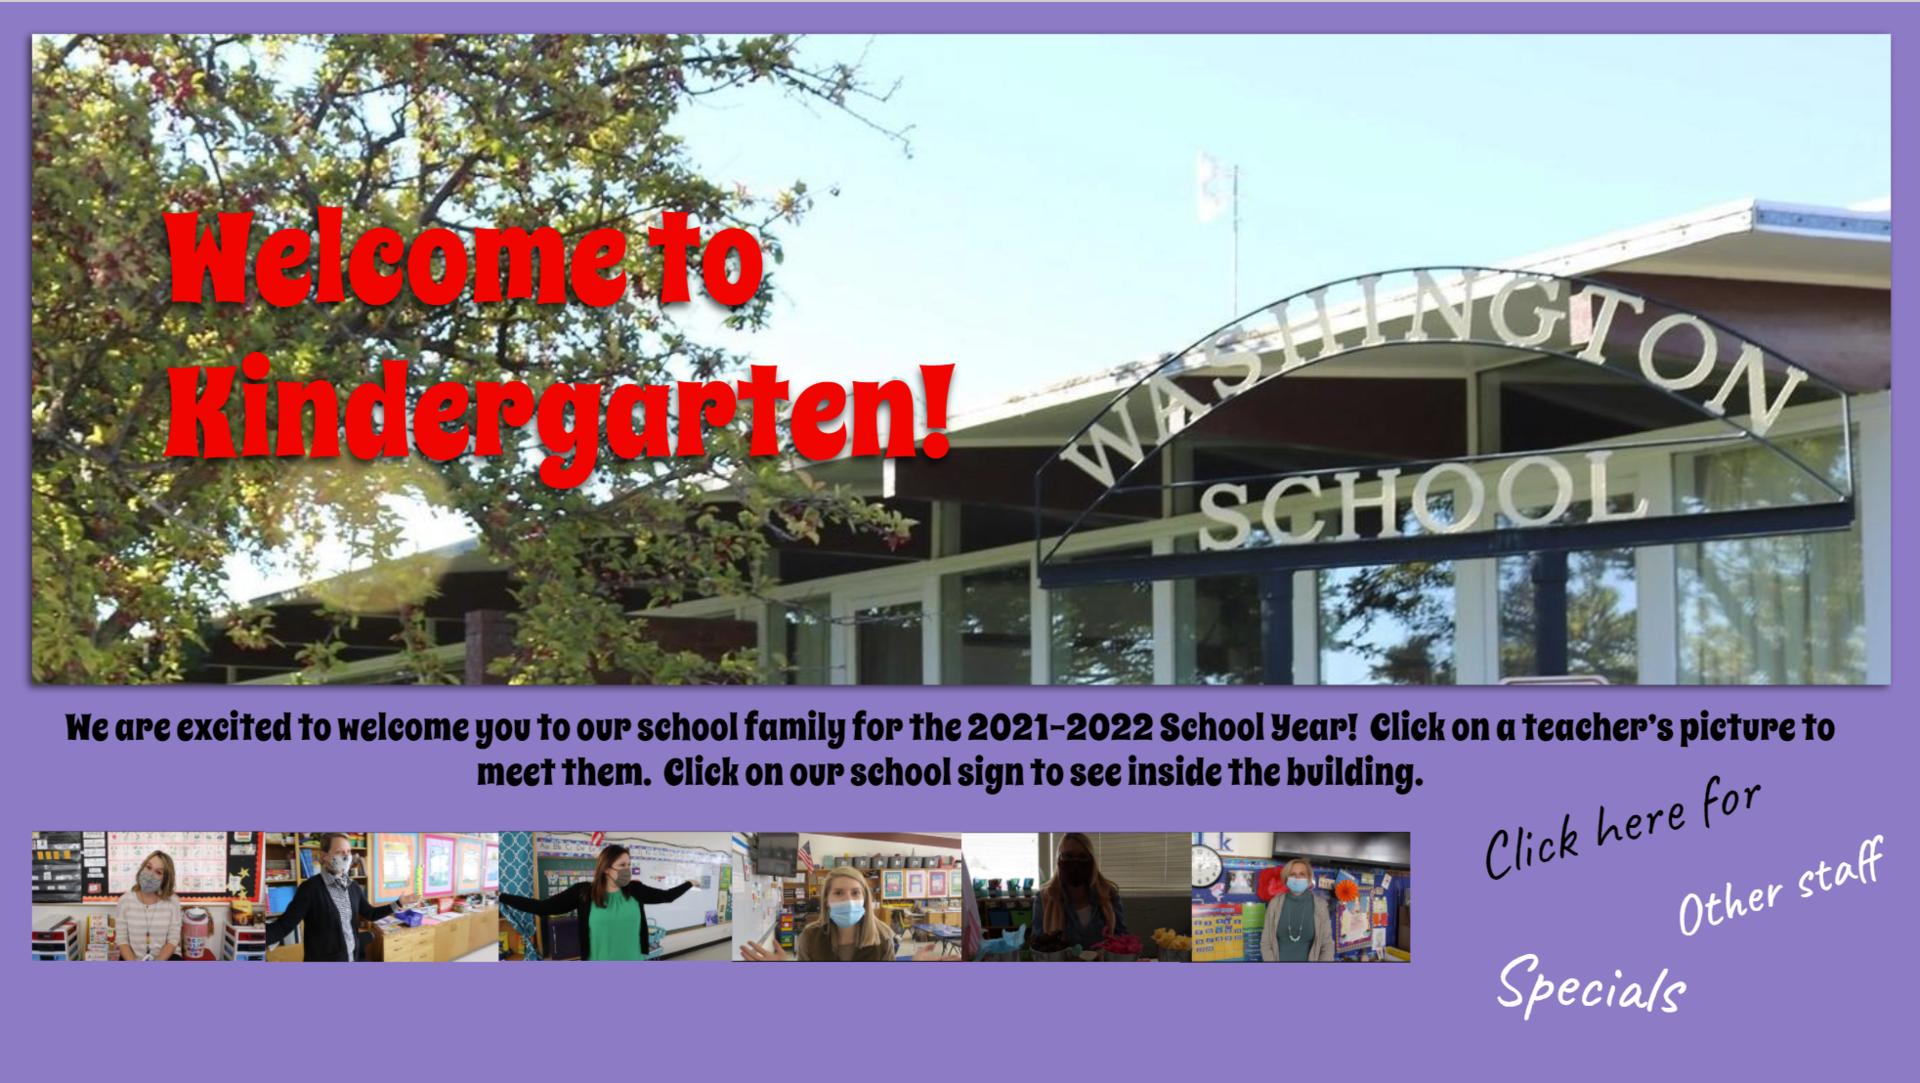 Welcome to Kindergarten Slide Deck Link: Pictures of teachers and Washington School Sign